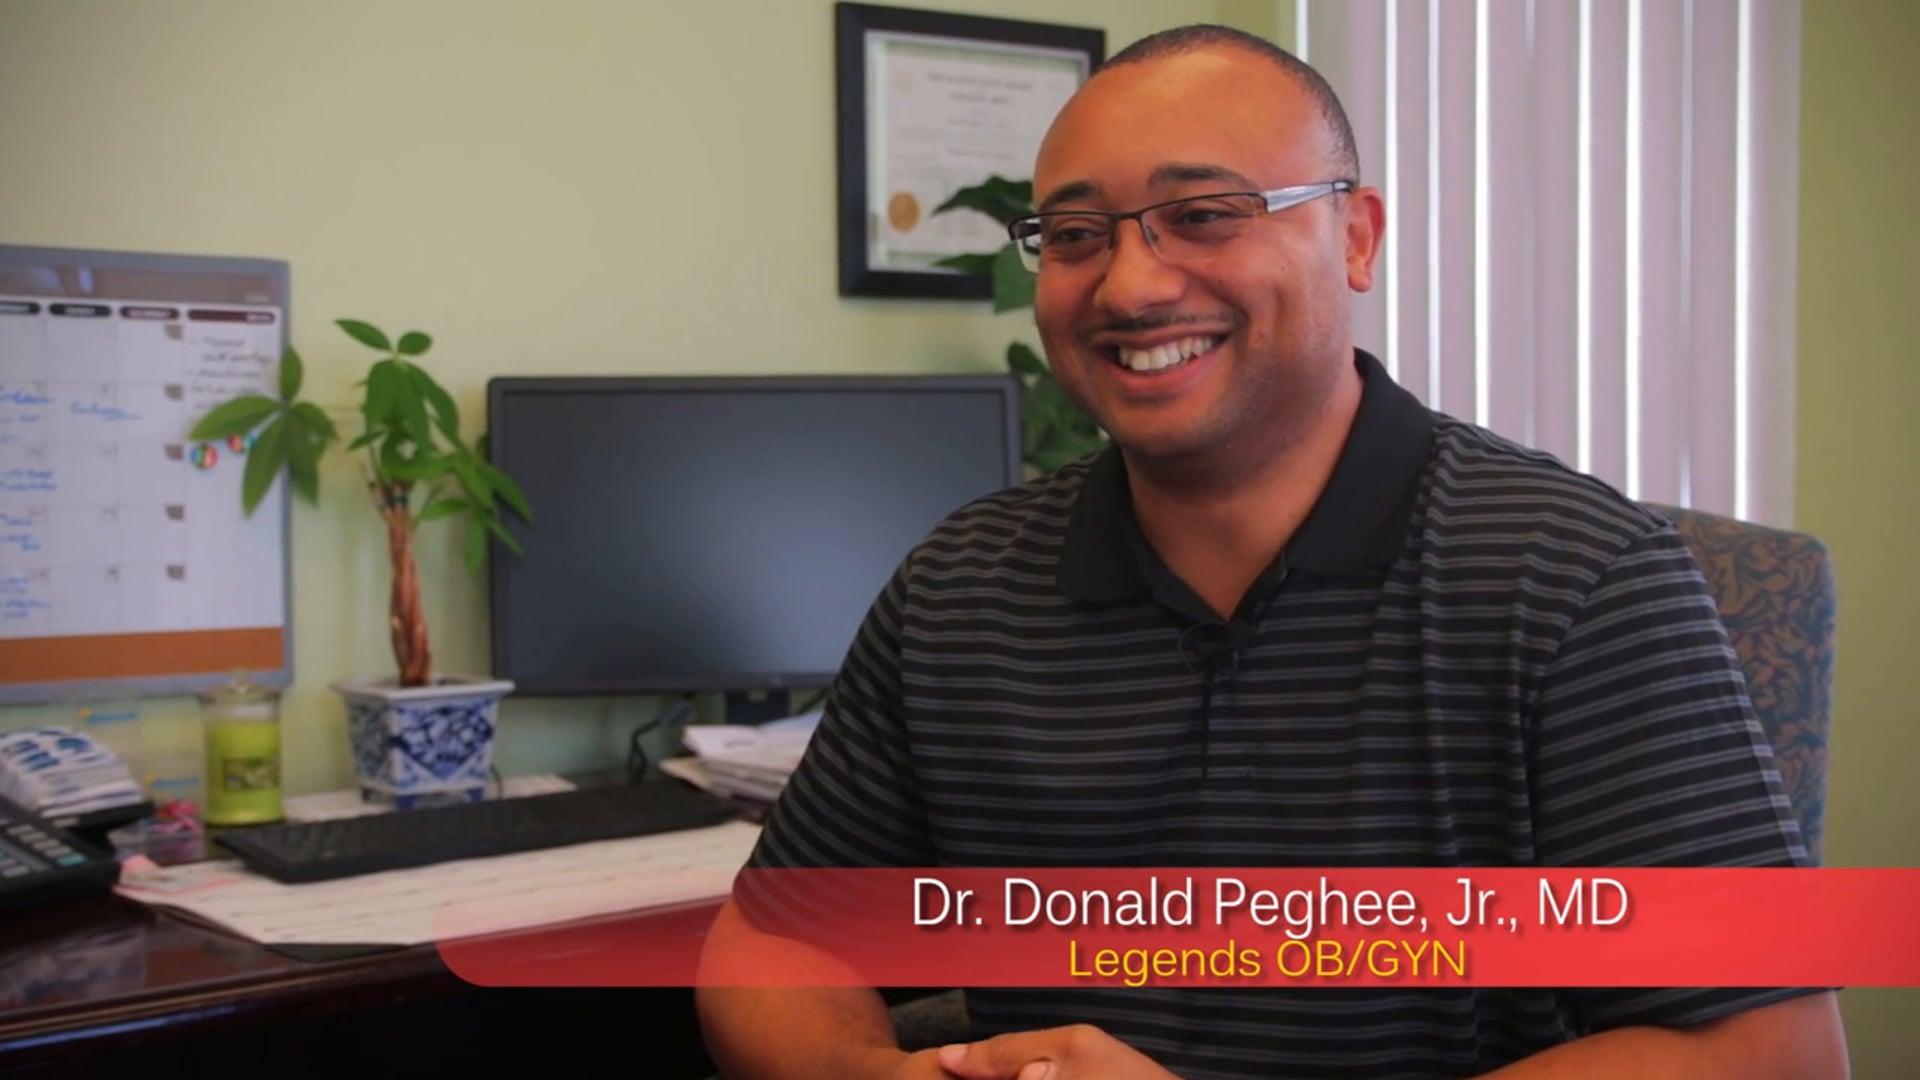 Dr. Donald Peghee